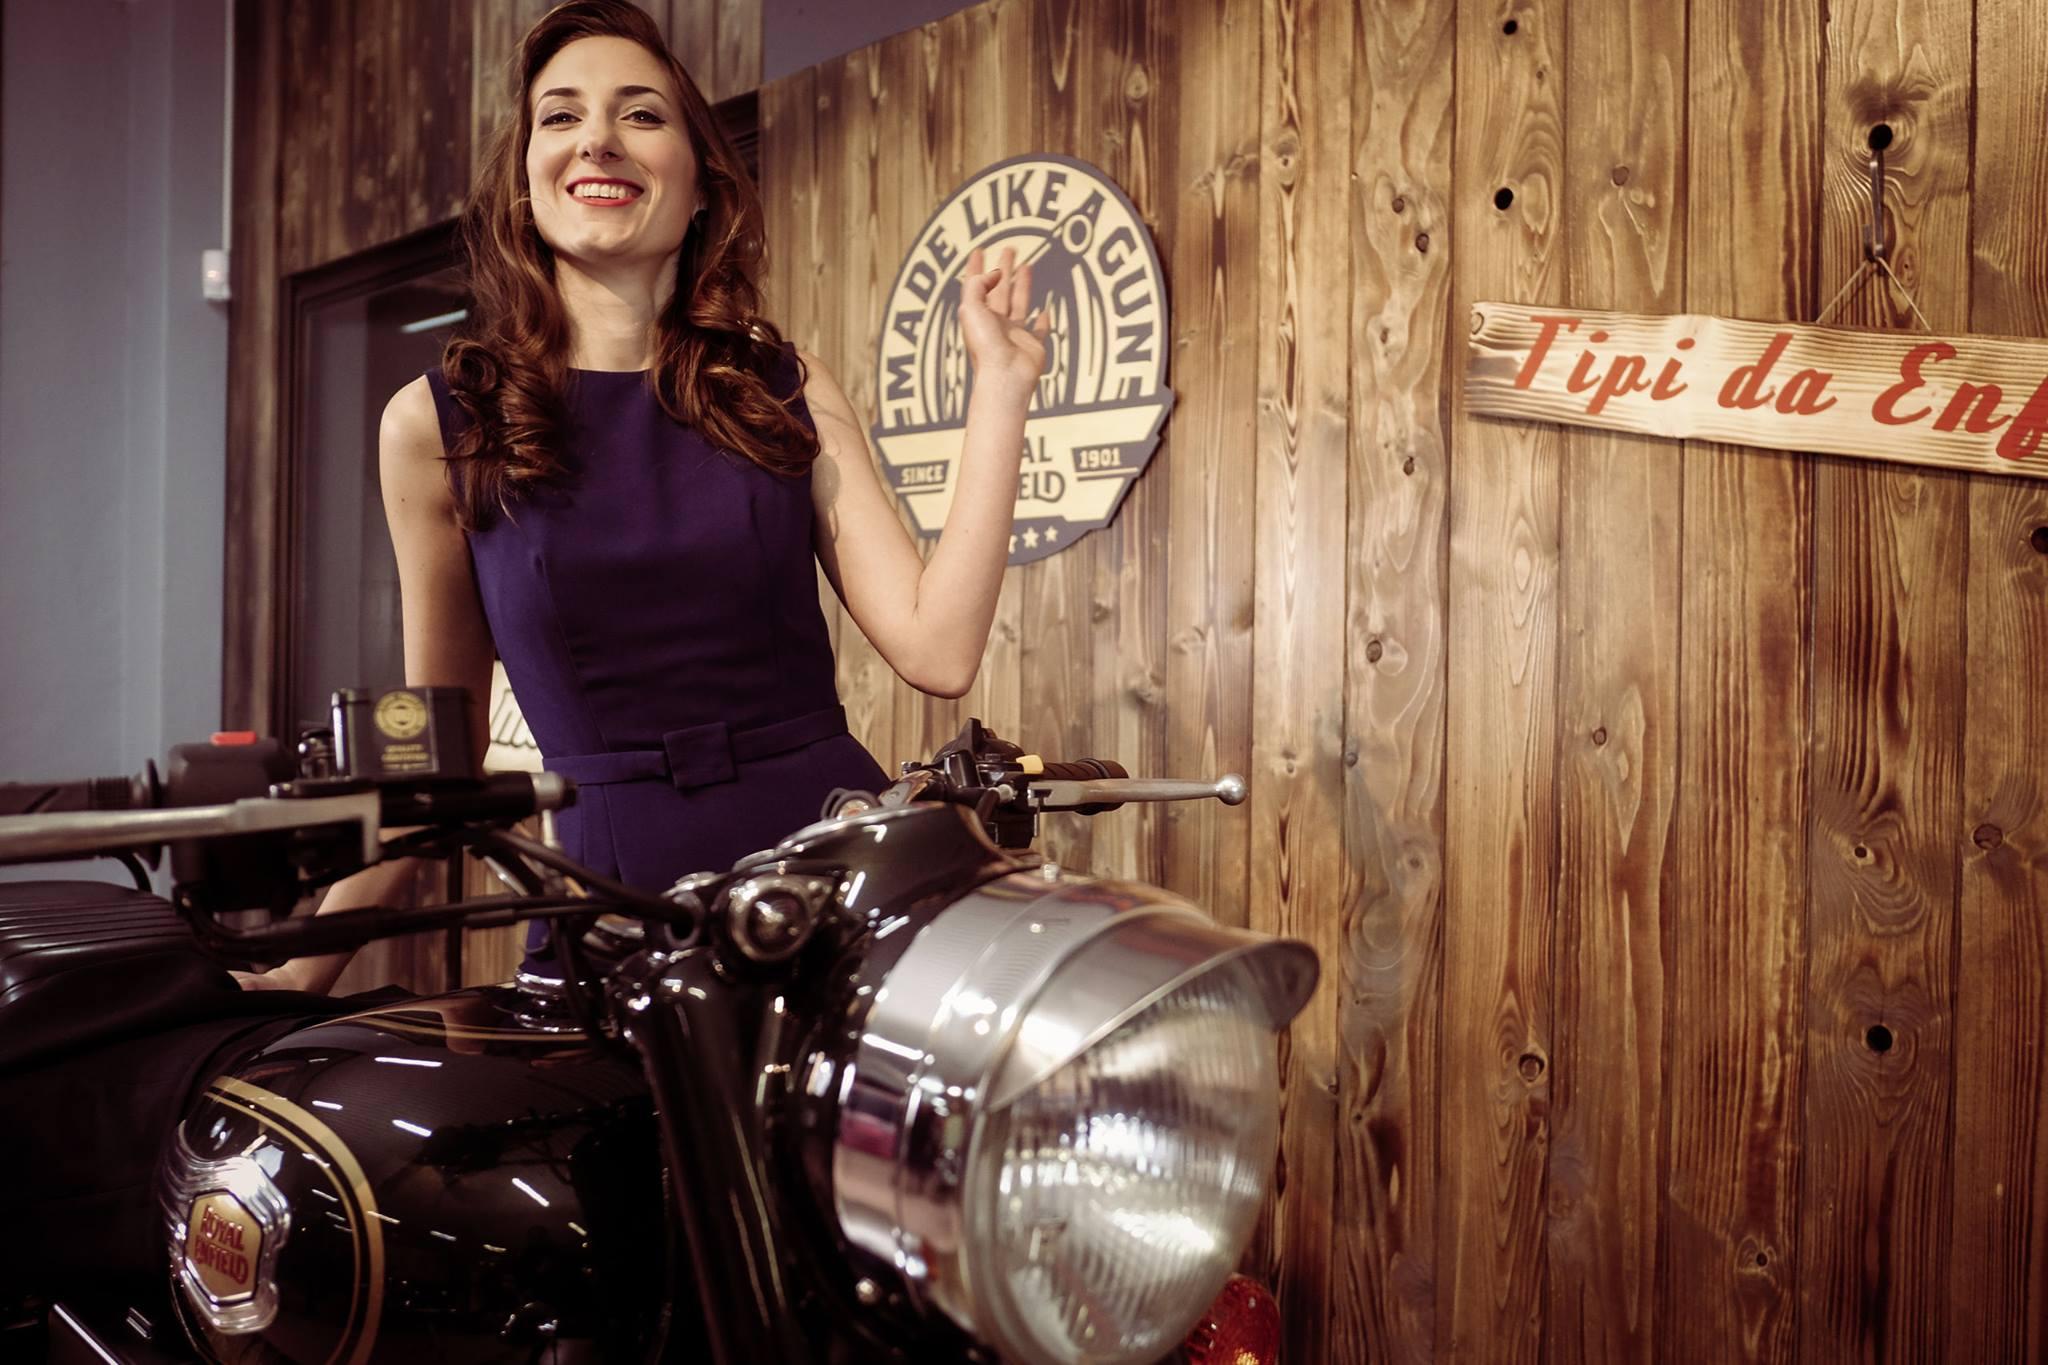 royal-enfield-piacenza-moruzzi-moto-wonderland-campagna-promo-9